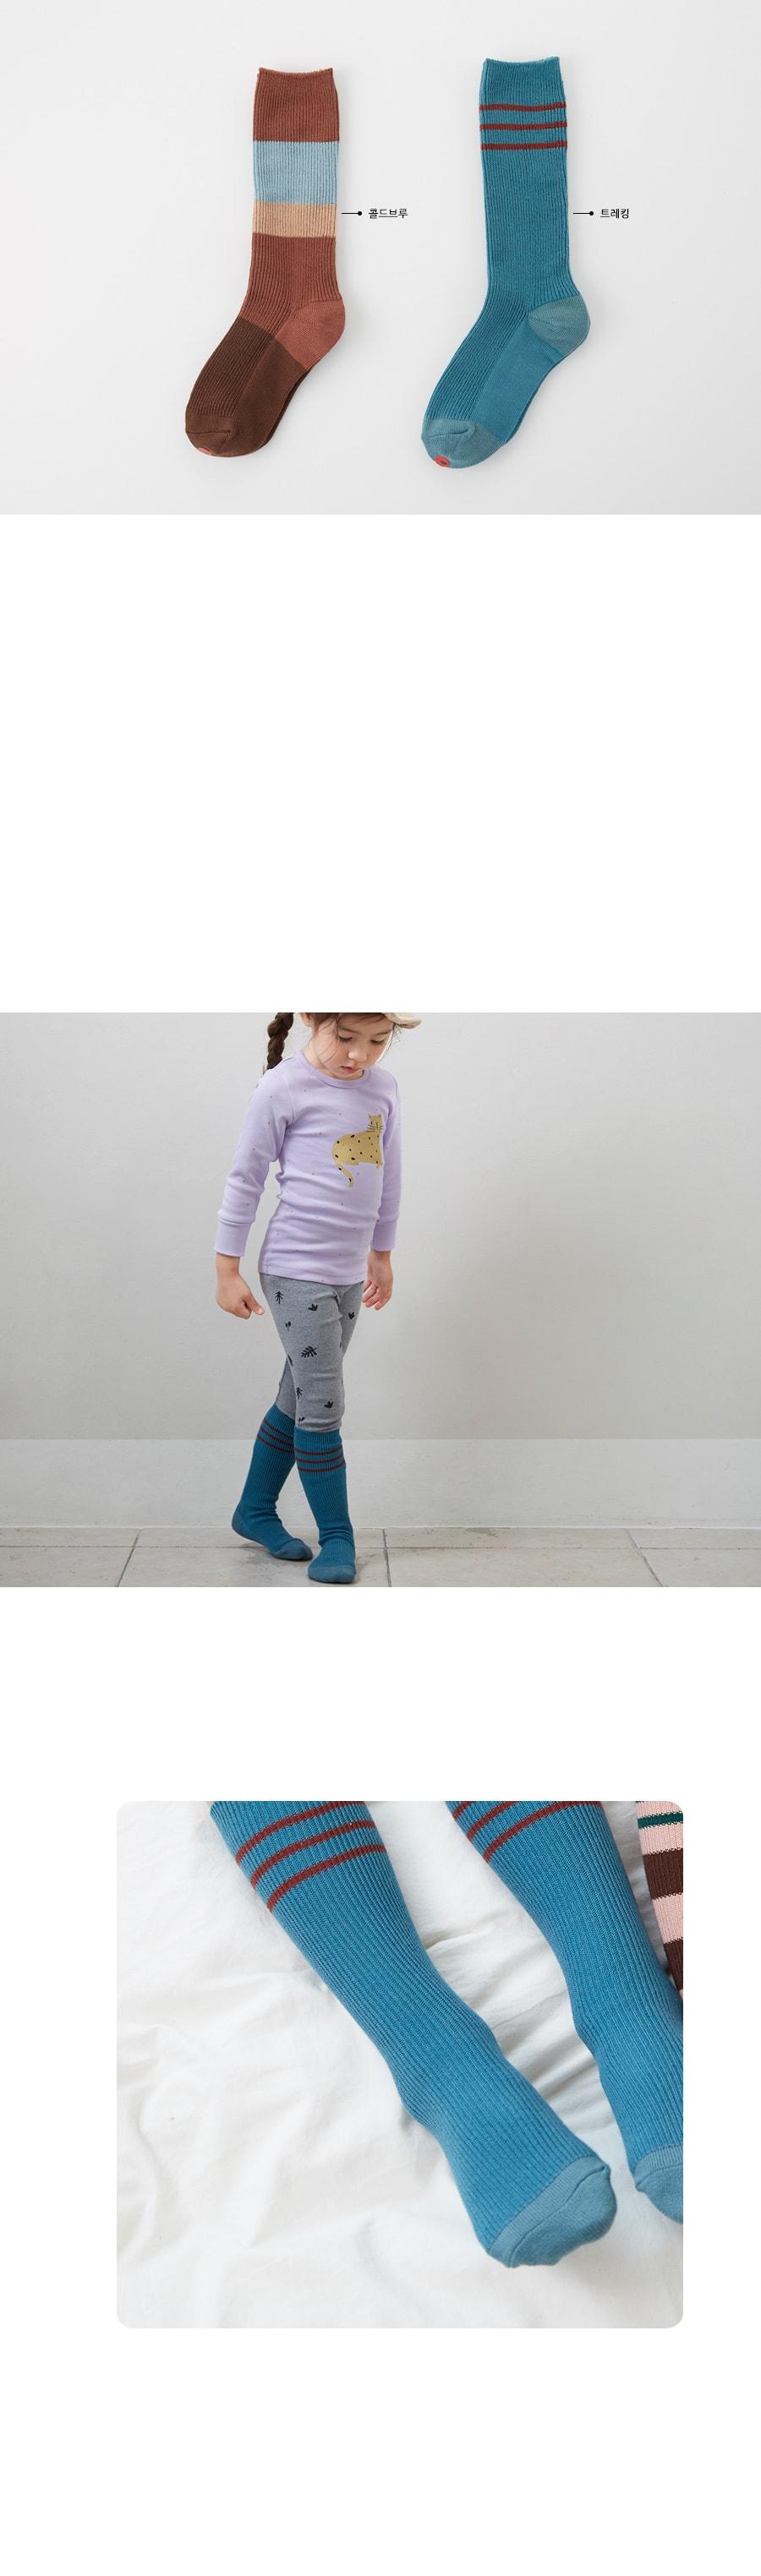 KOKACHARM - Korean Children Fashion - #Kfashion4kids - Tracking Socks - 2